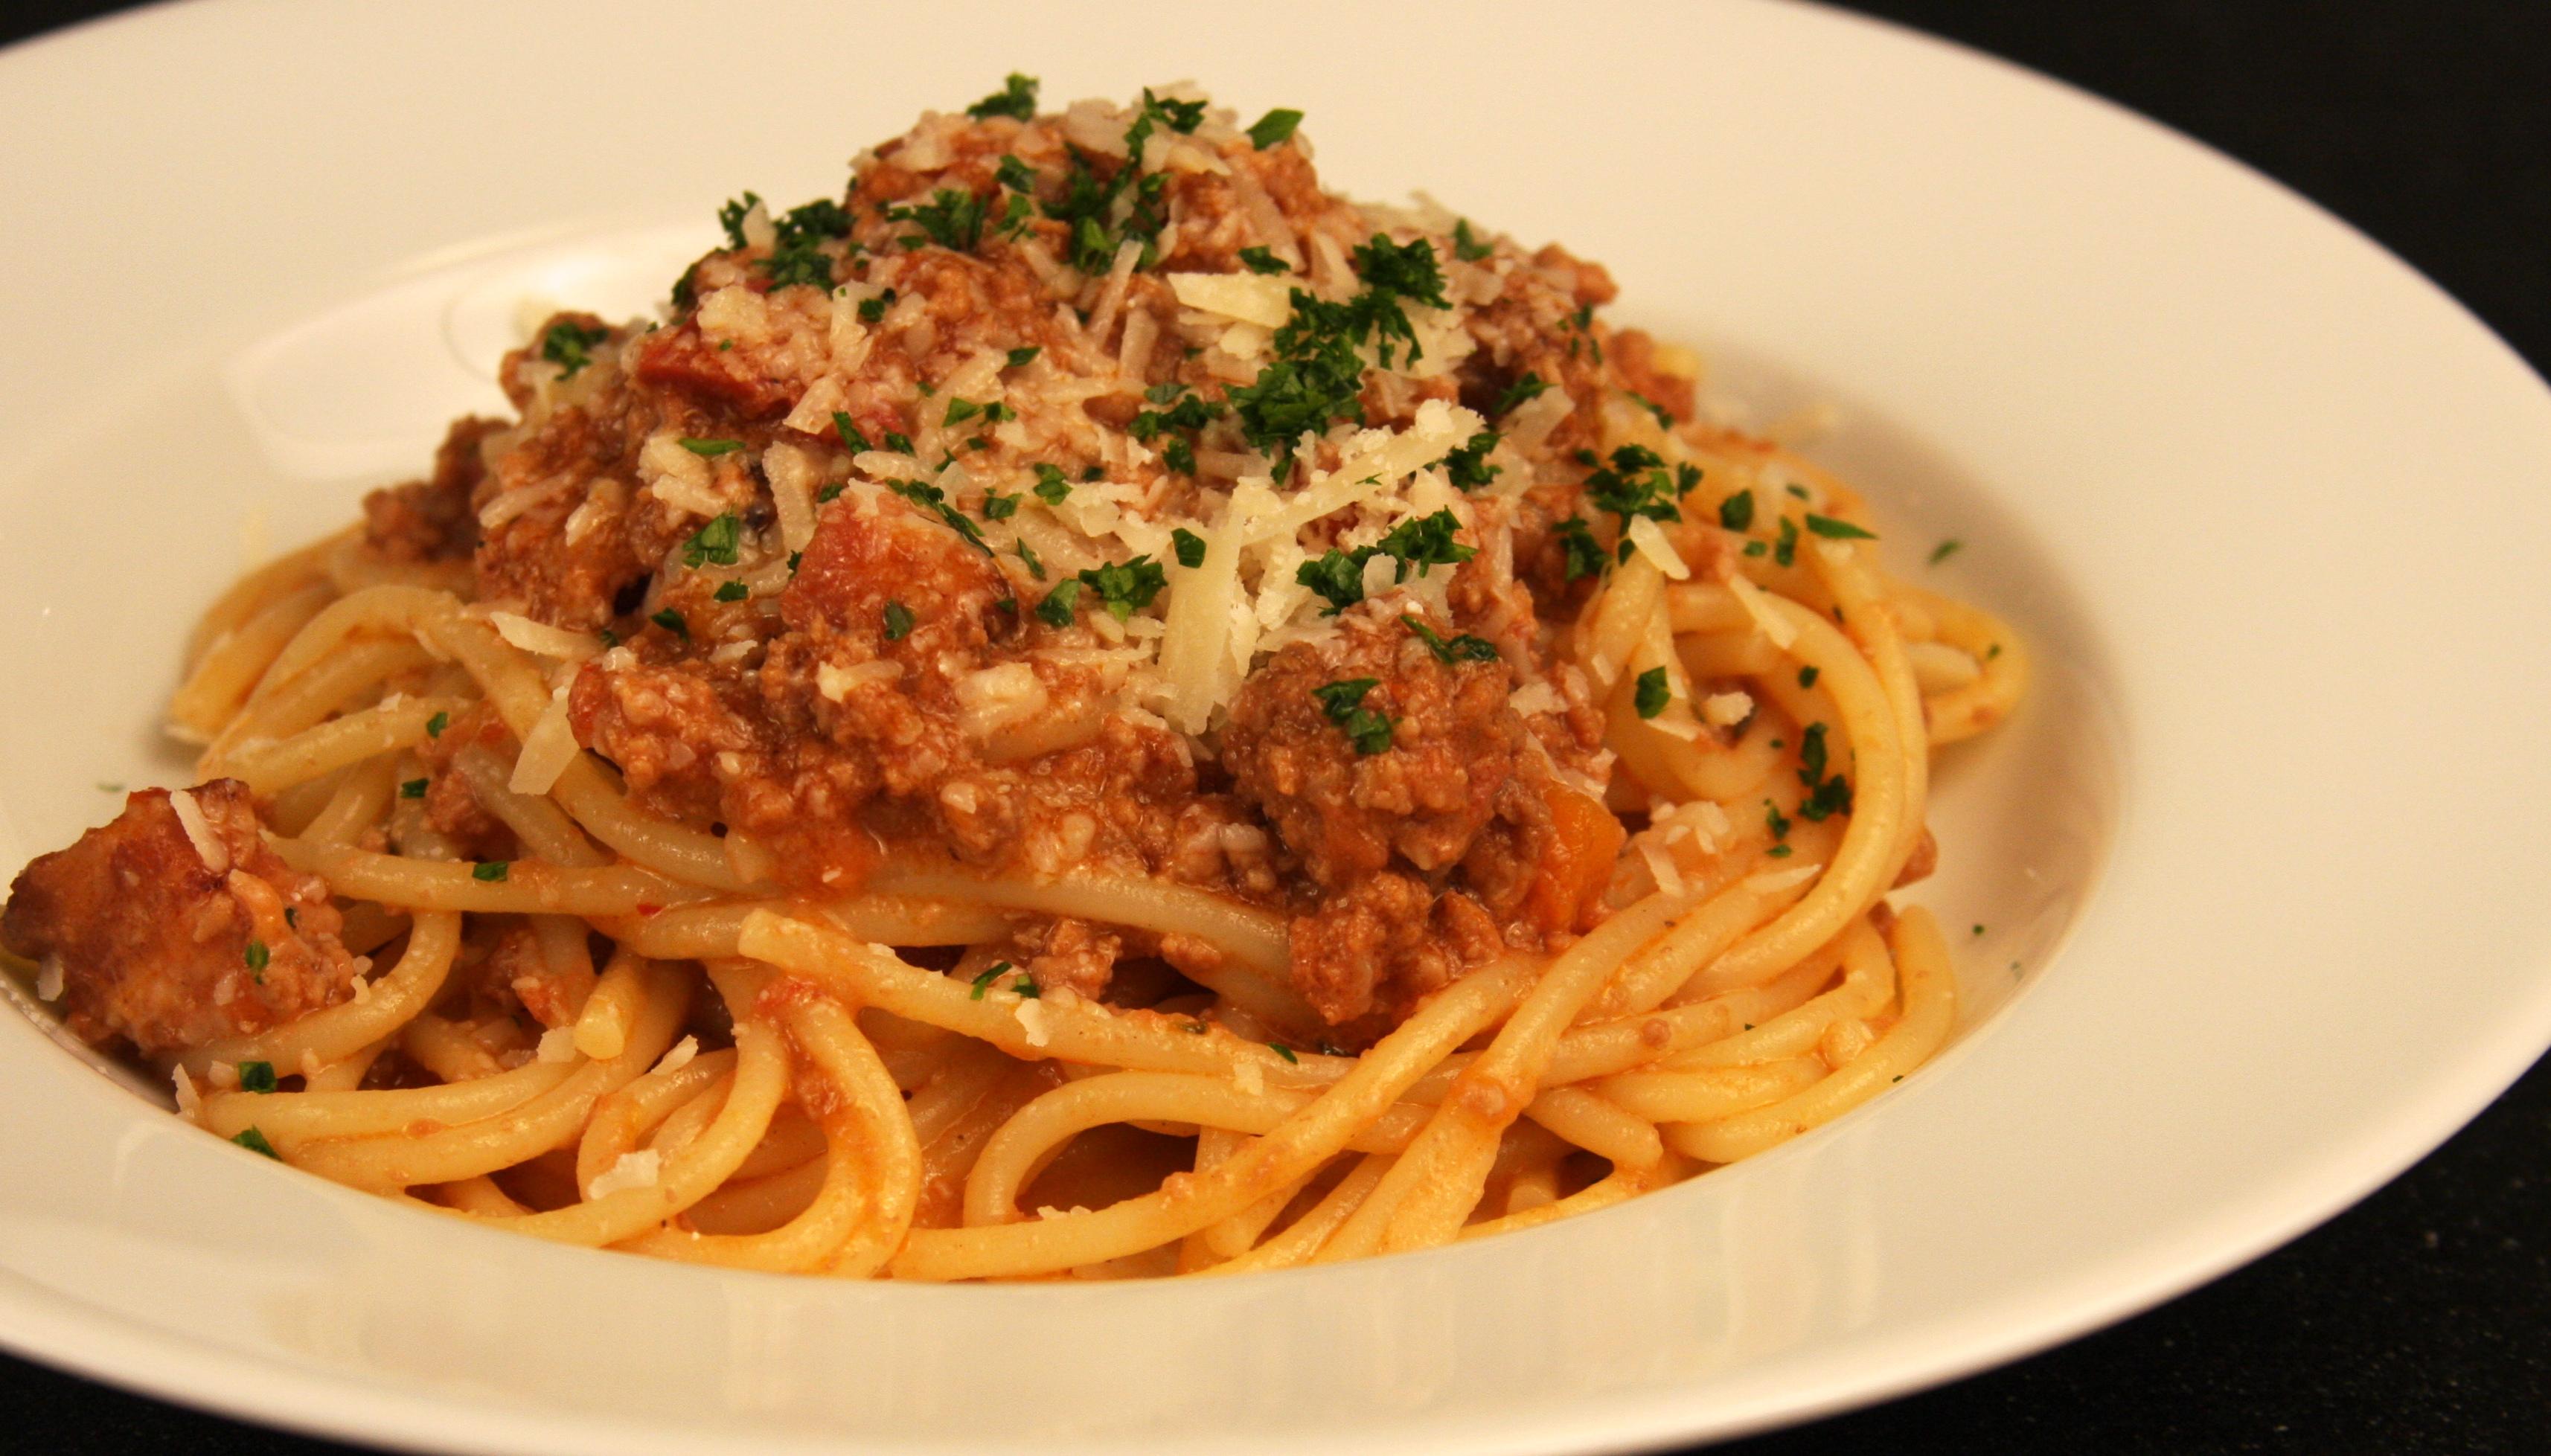 ... spaghetti bolognese spaghetti bolognese a firm spaghetti bolognese on